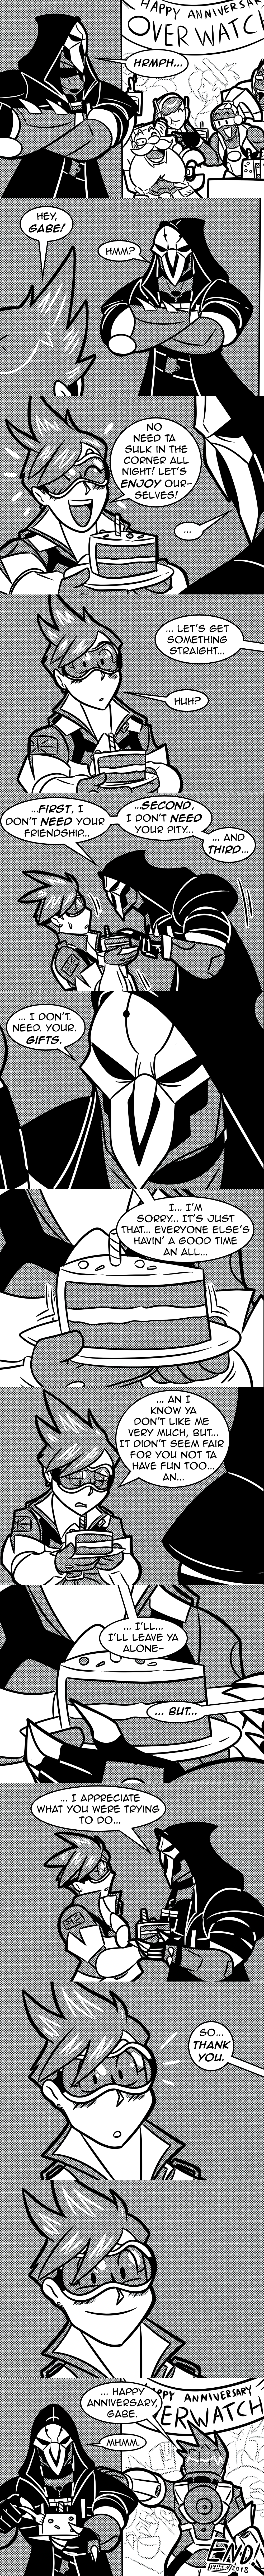 Overwatch Anniversary Comic by MichaelJLarson